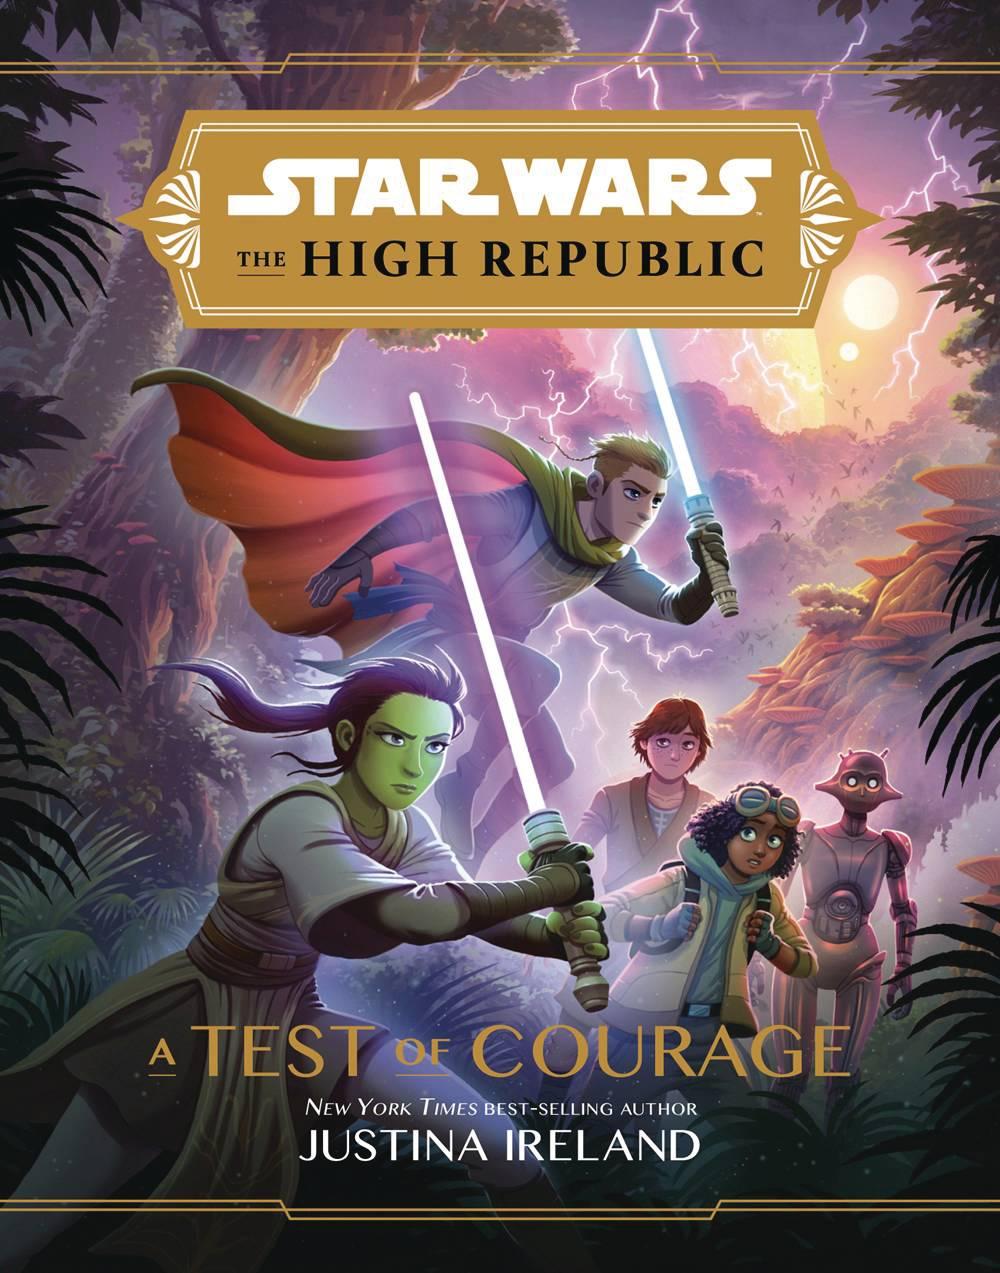 STAR WARS HIGH REPUBLIC YA HC NOVEL TEST OF COURAGE